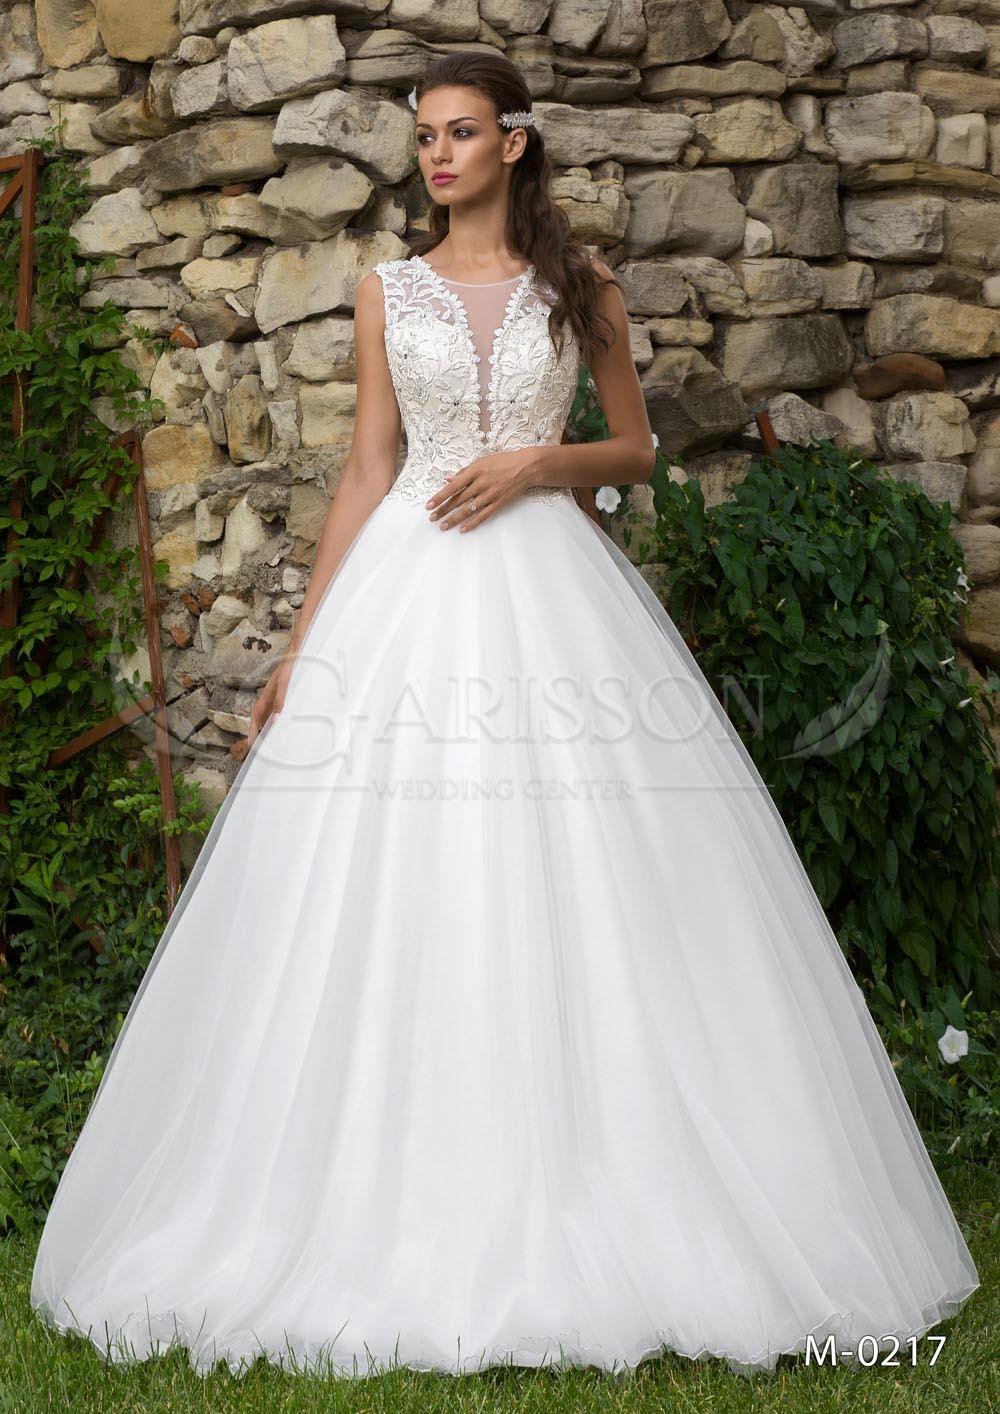 ecf205f27 Svadobné šaty M217 - Garisson